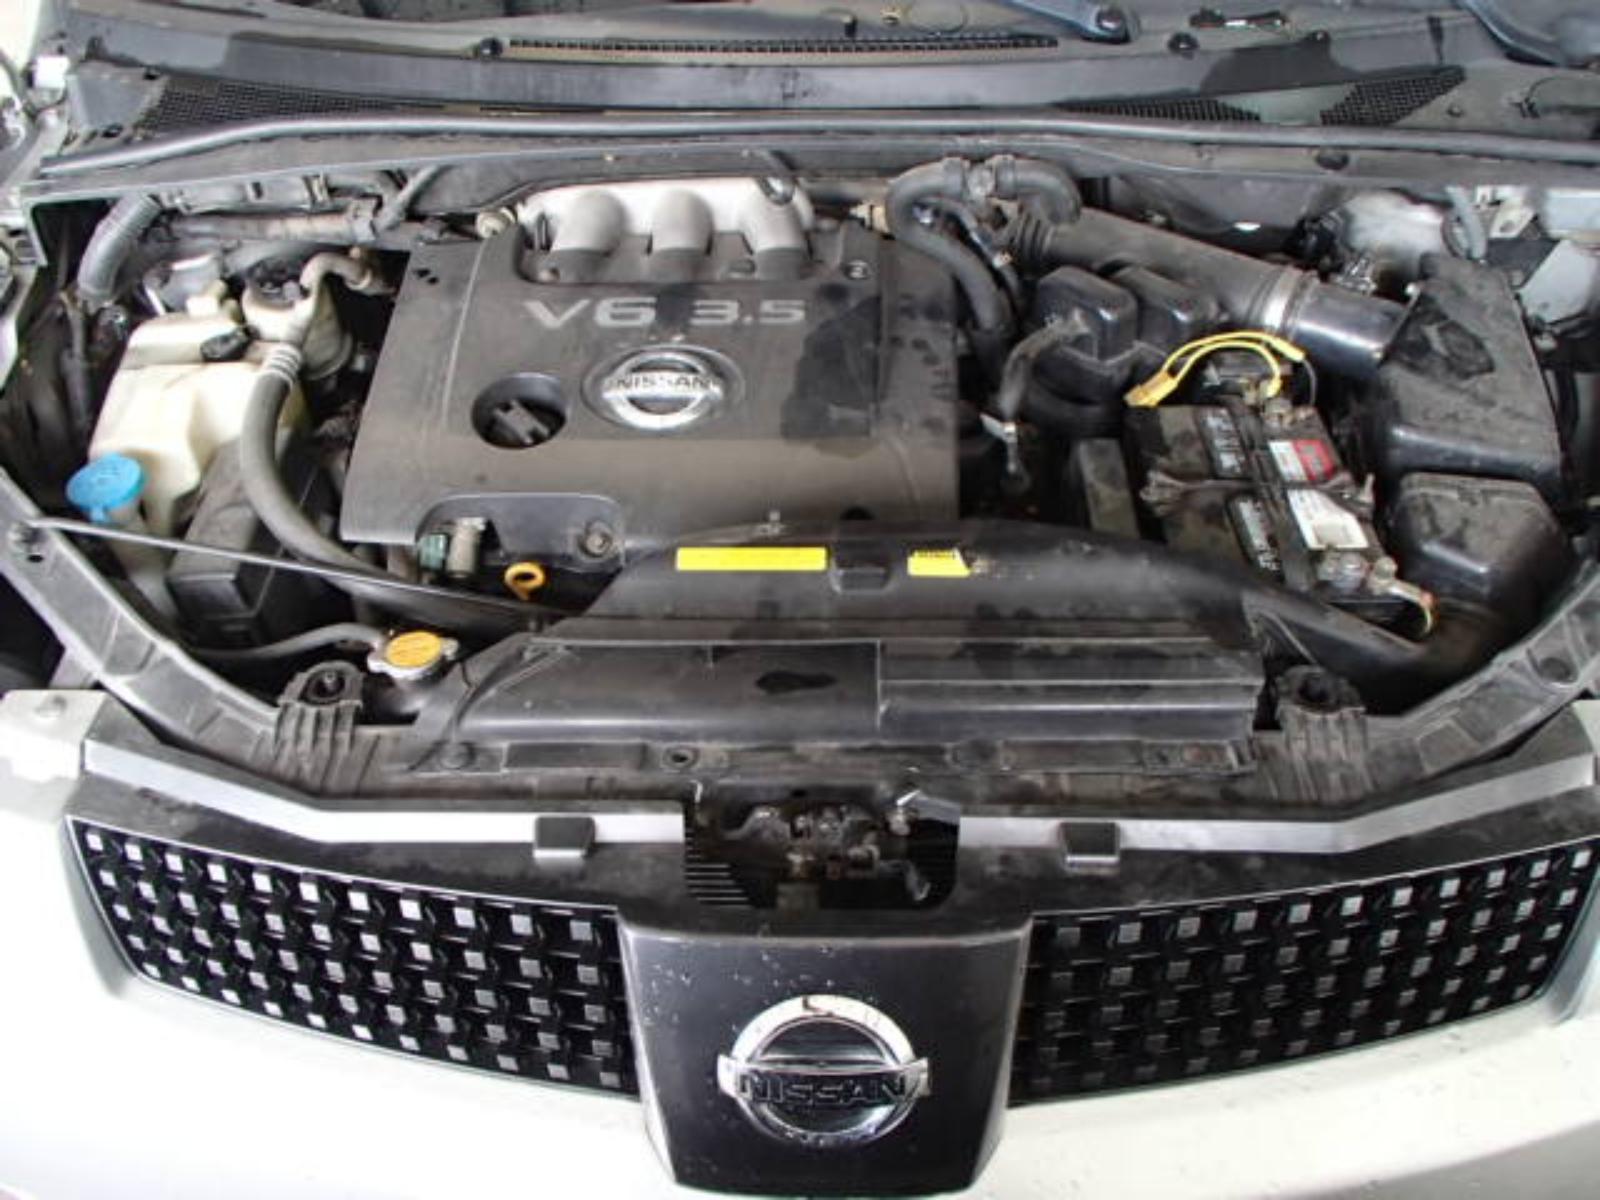 2006 Nissan Maxima Motor Mount Diagram Trusted Wiring Quest 2004 Engine Circuit U2022 Pontiac Grand Prix